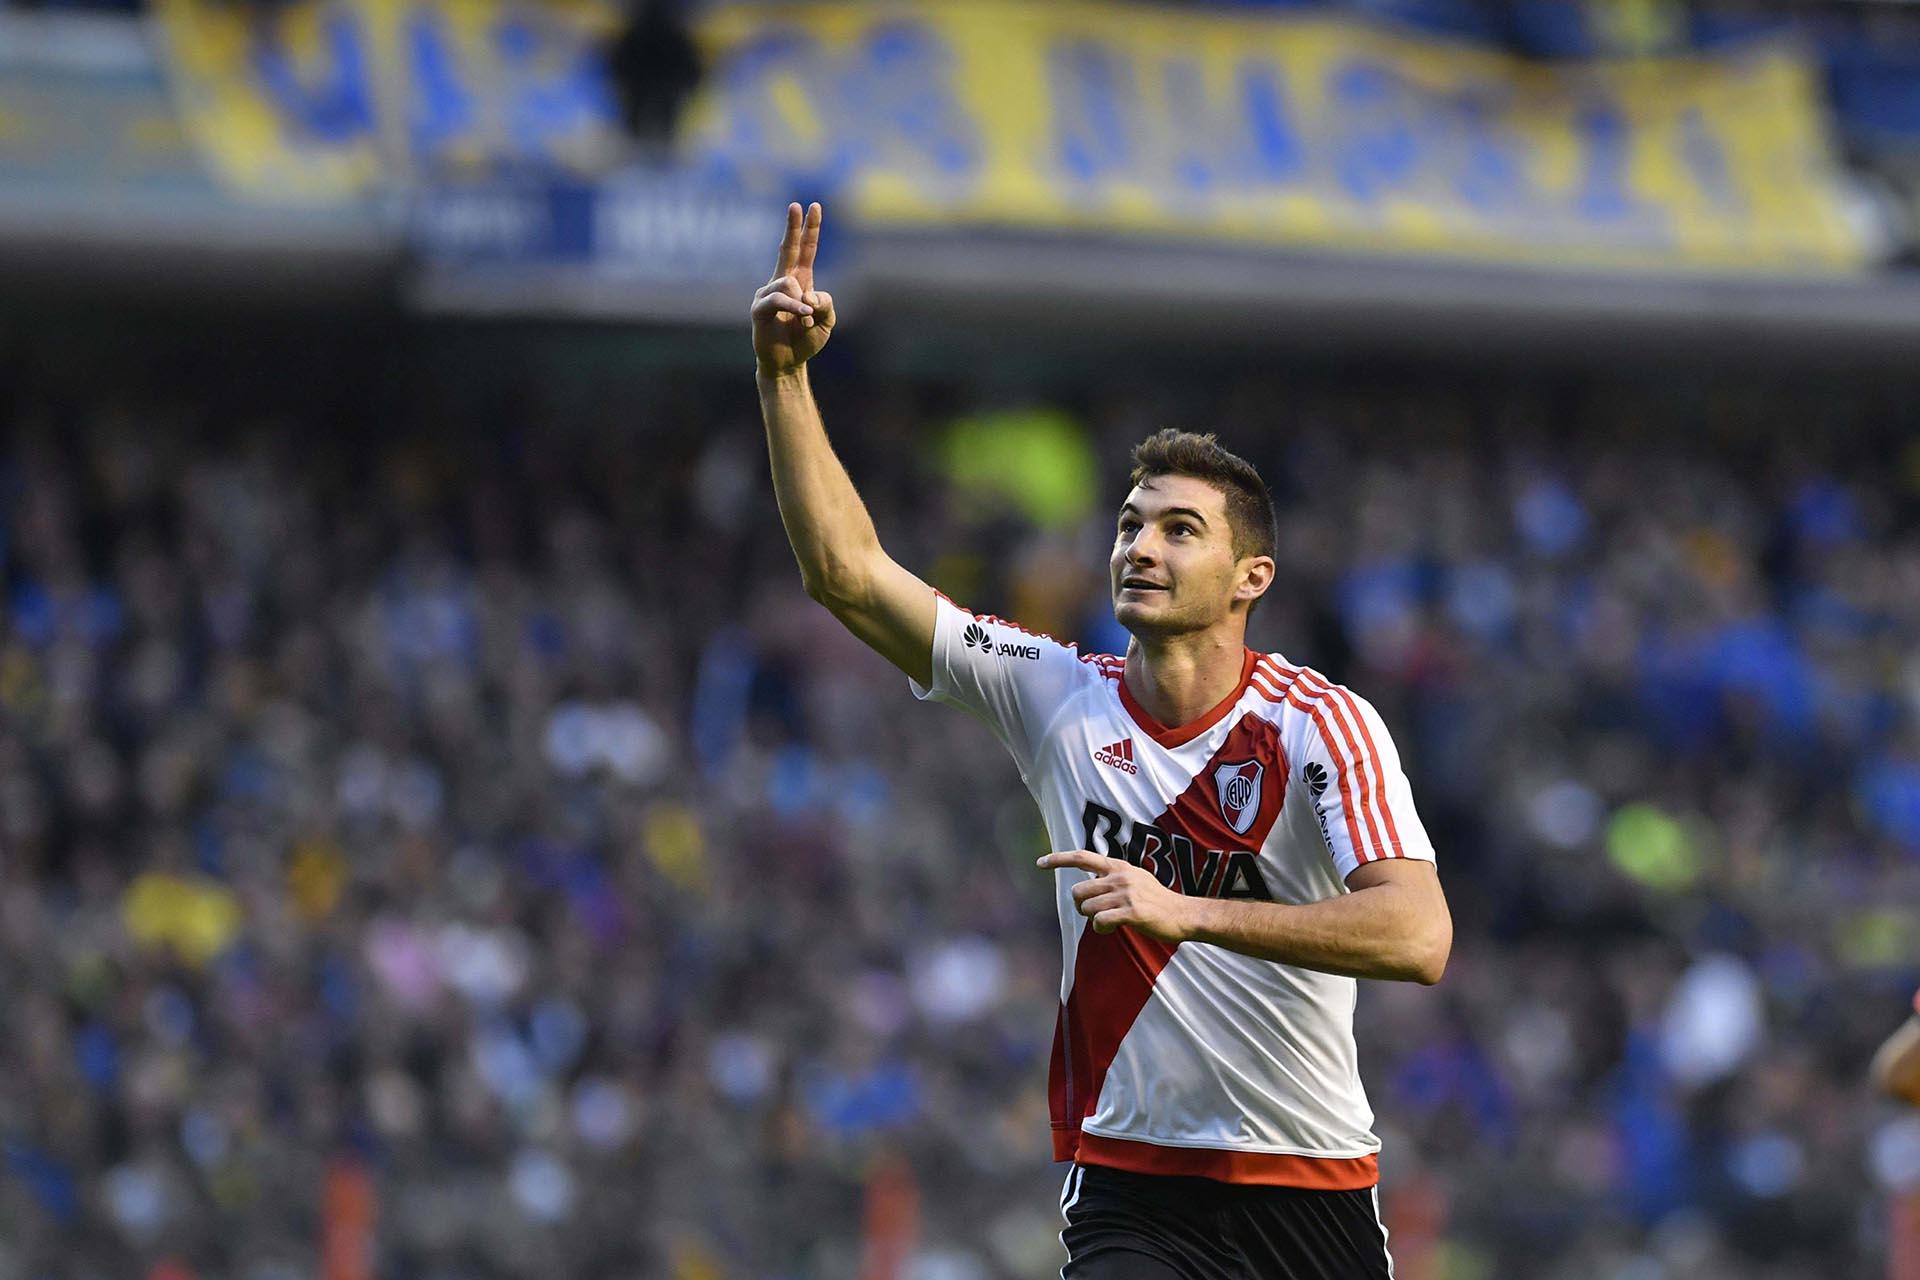 Lucás Alario festeja su gol, el segundo a favor de River que supera a Boca por 2 a 0